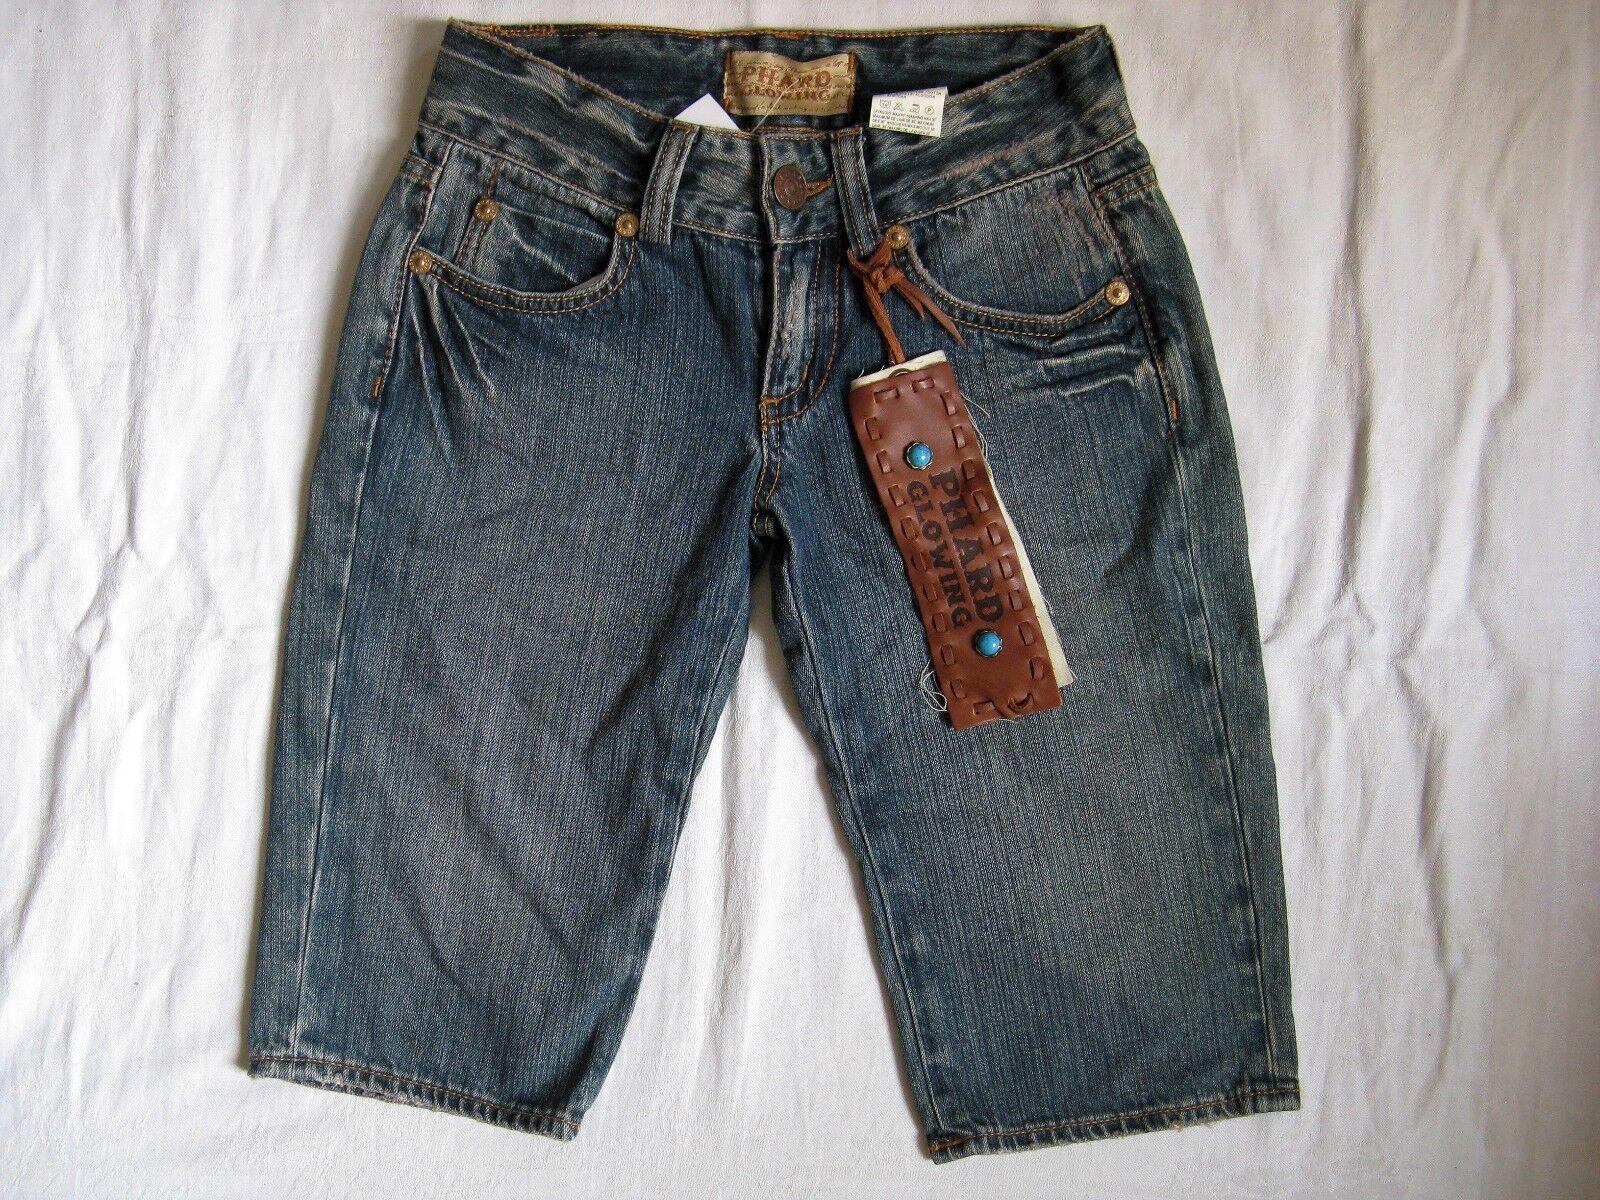 PHARD Glowing bluee Jeans Shorts W25 x-low waist regular fit short leg women